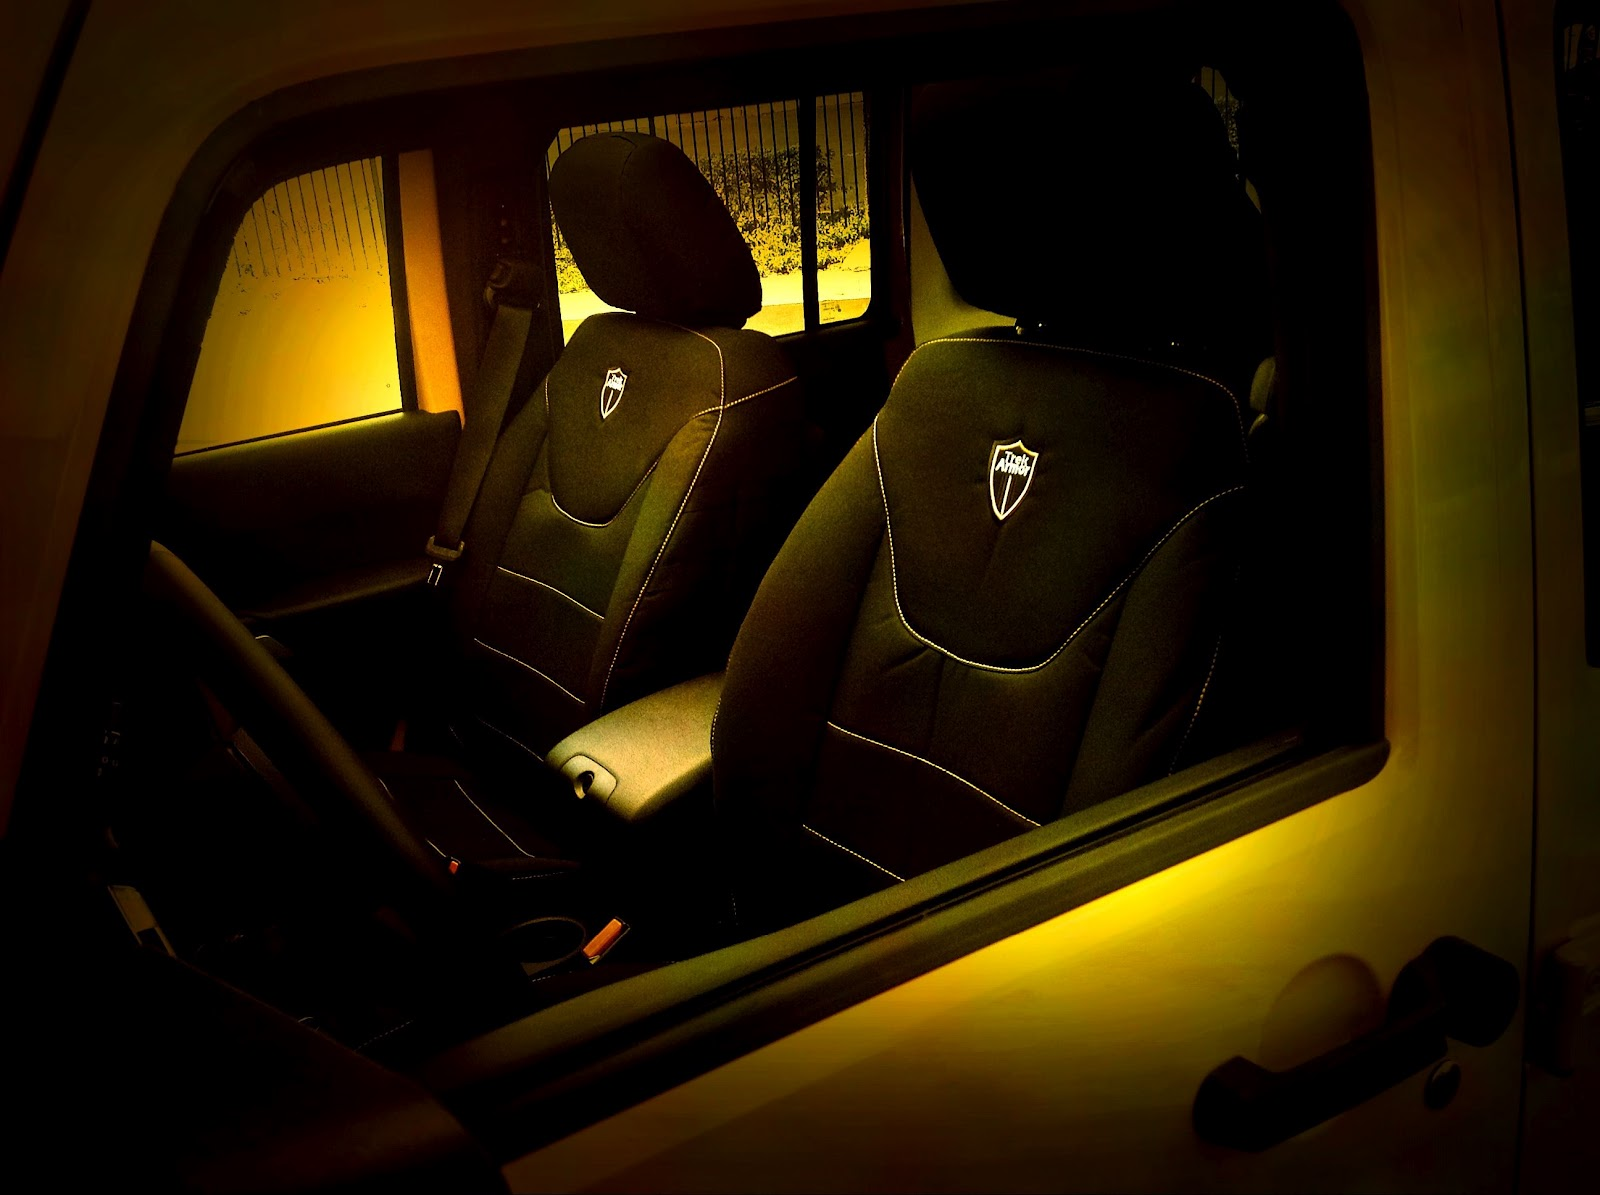 Trek Armor Seat Covers